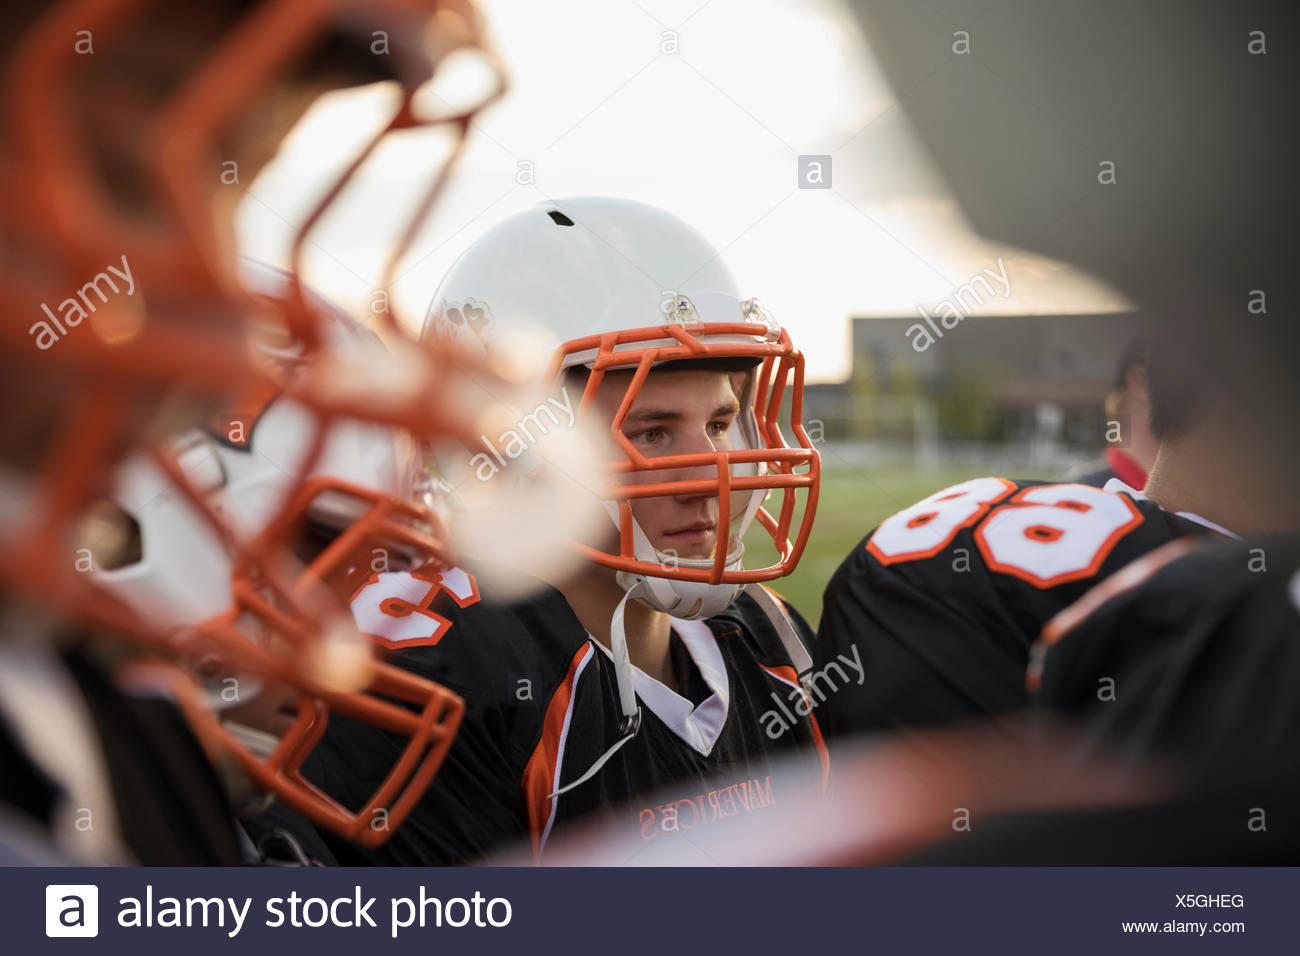 Teenage boy high school football player wearing helmet and sports uniform - Stock Image